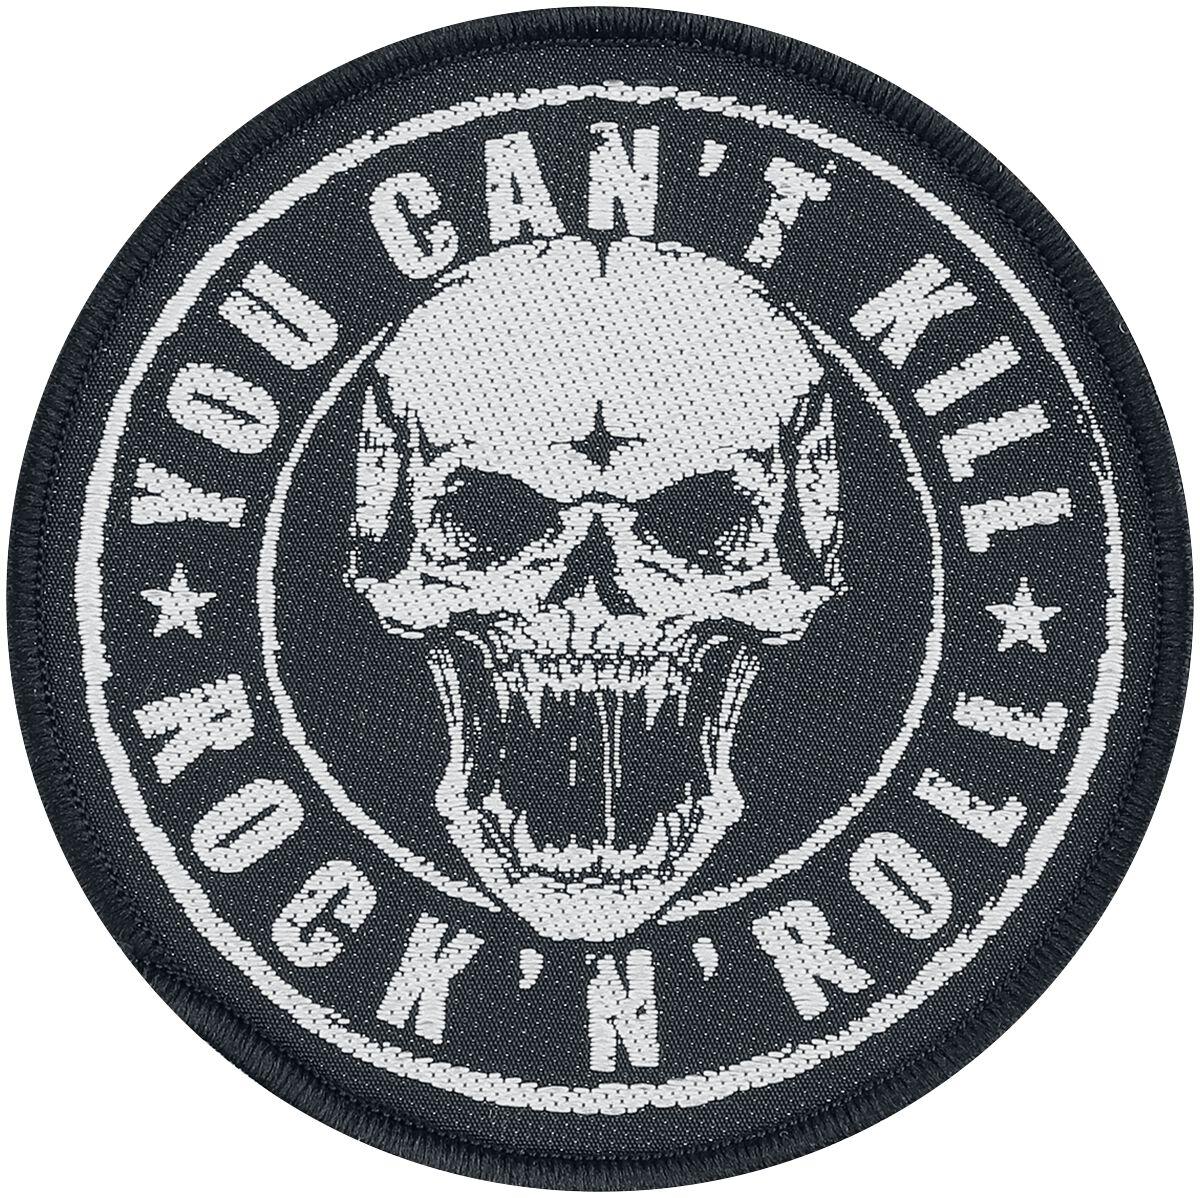 Generic You Can't Kill Rock N Roll  Patch  schwarz/weiß